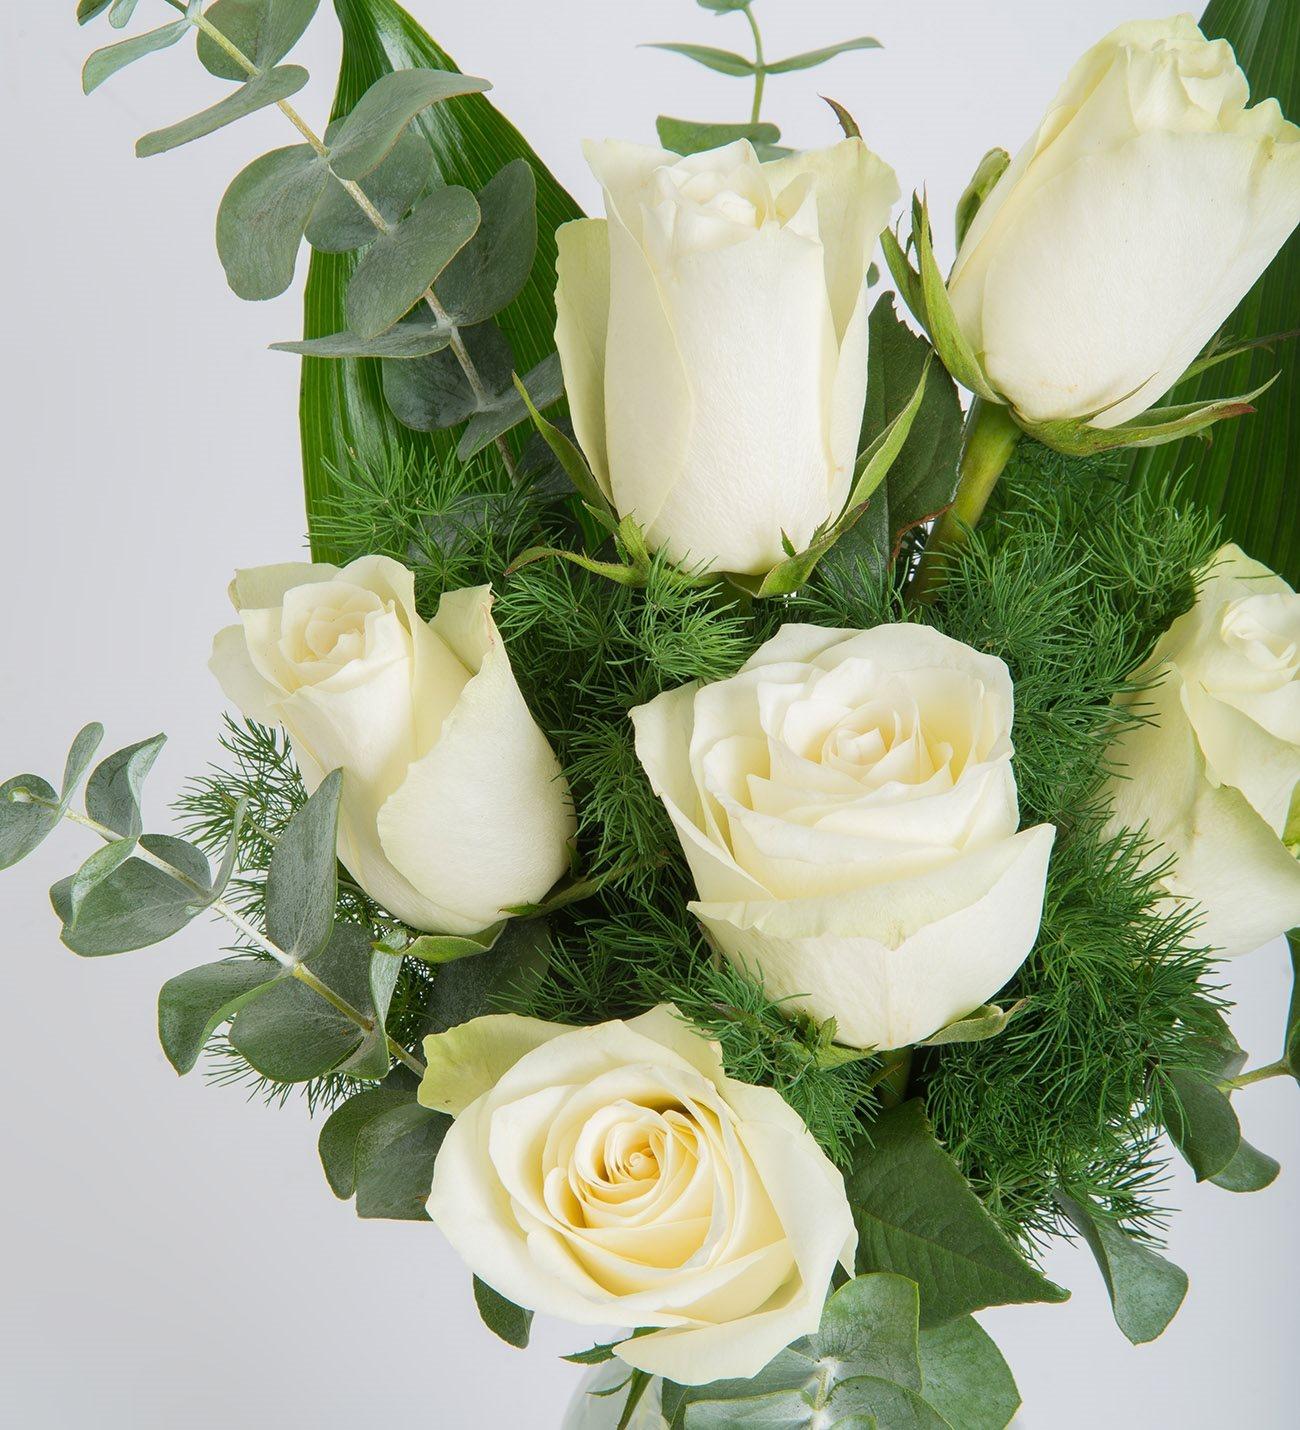 White As A Dove 6 White Roses